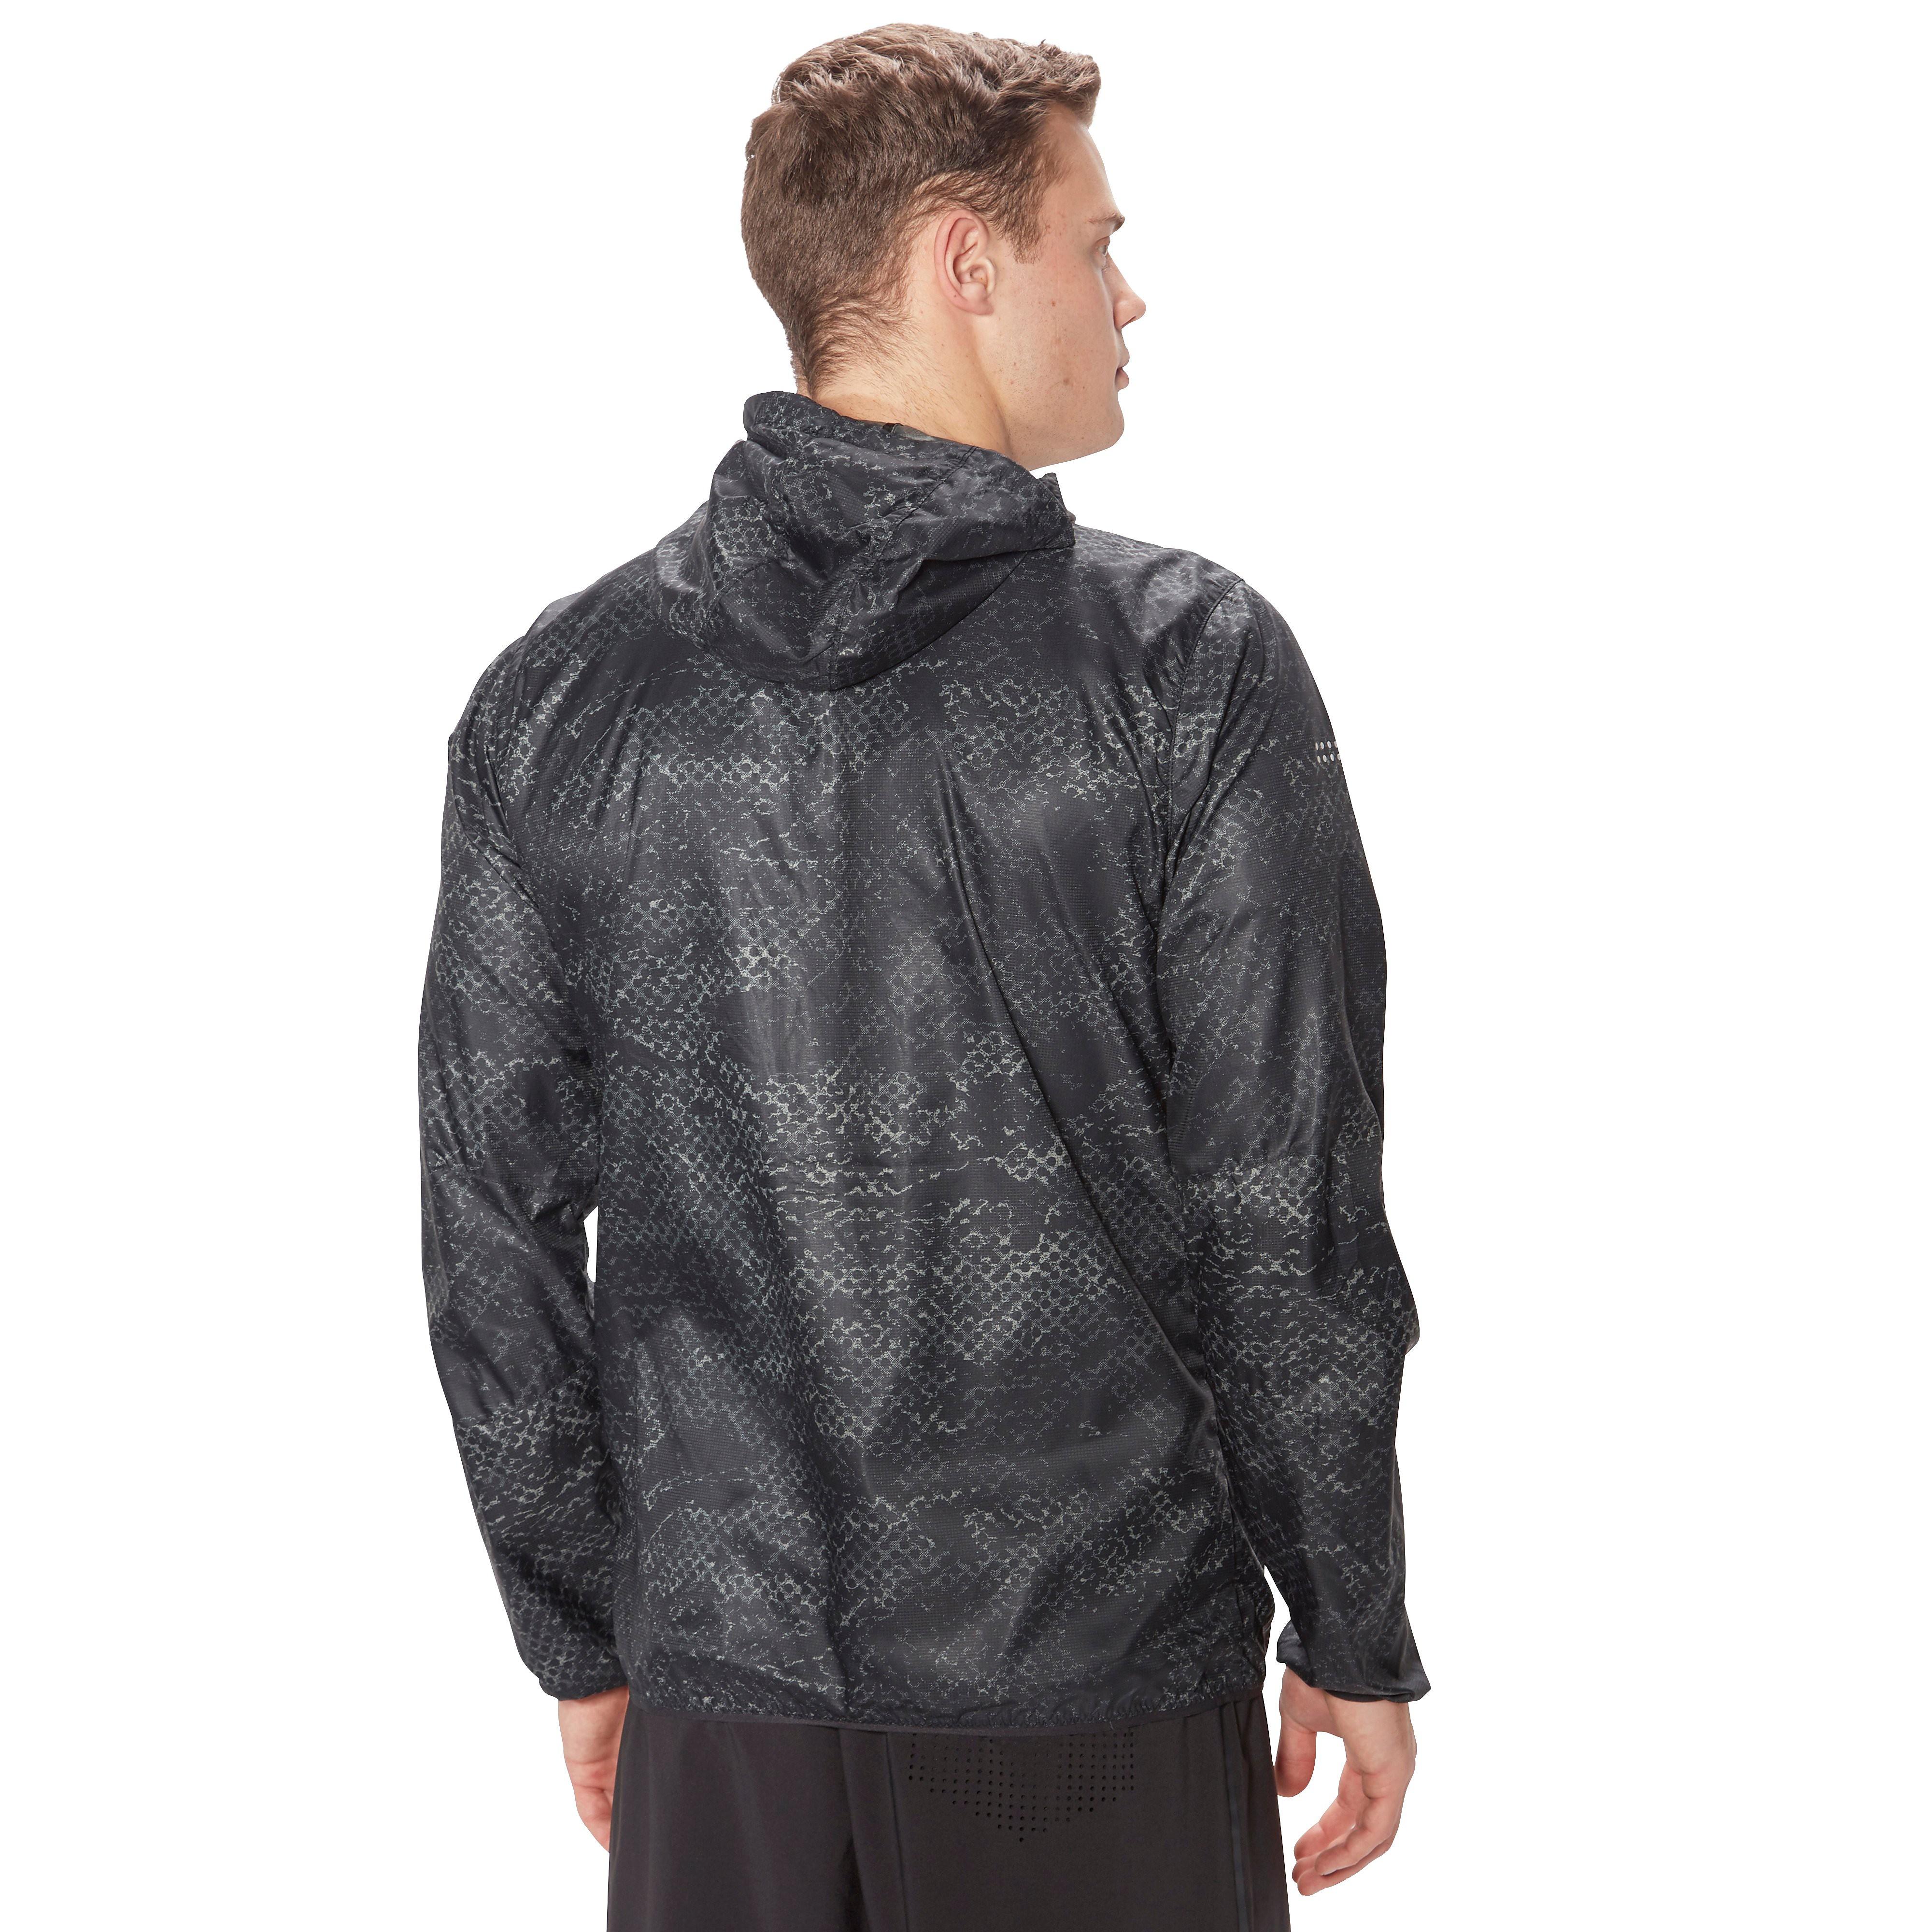 PUMA Graphic Men's Training Jacket